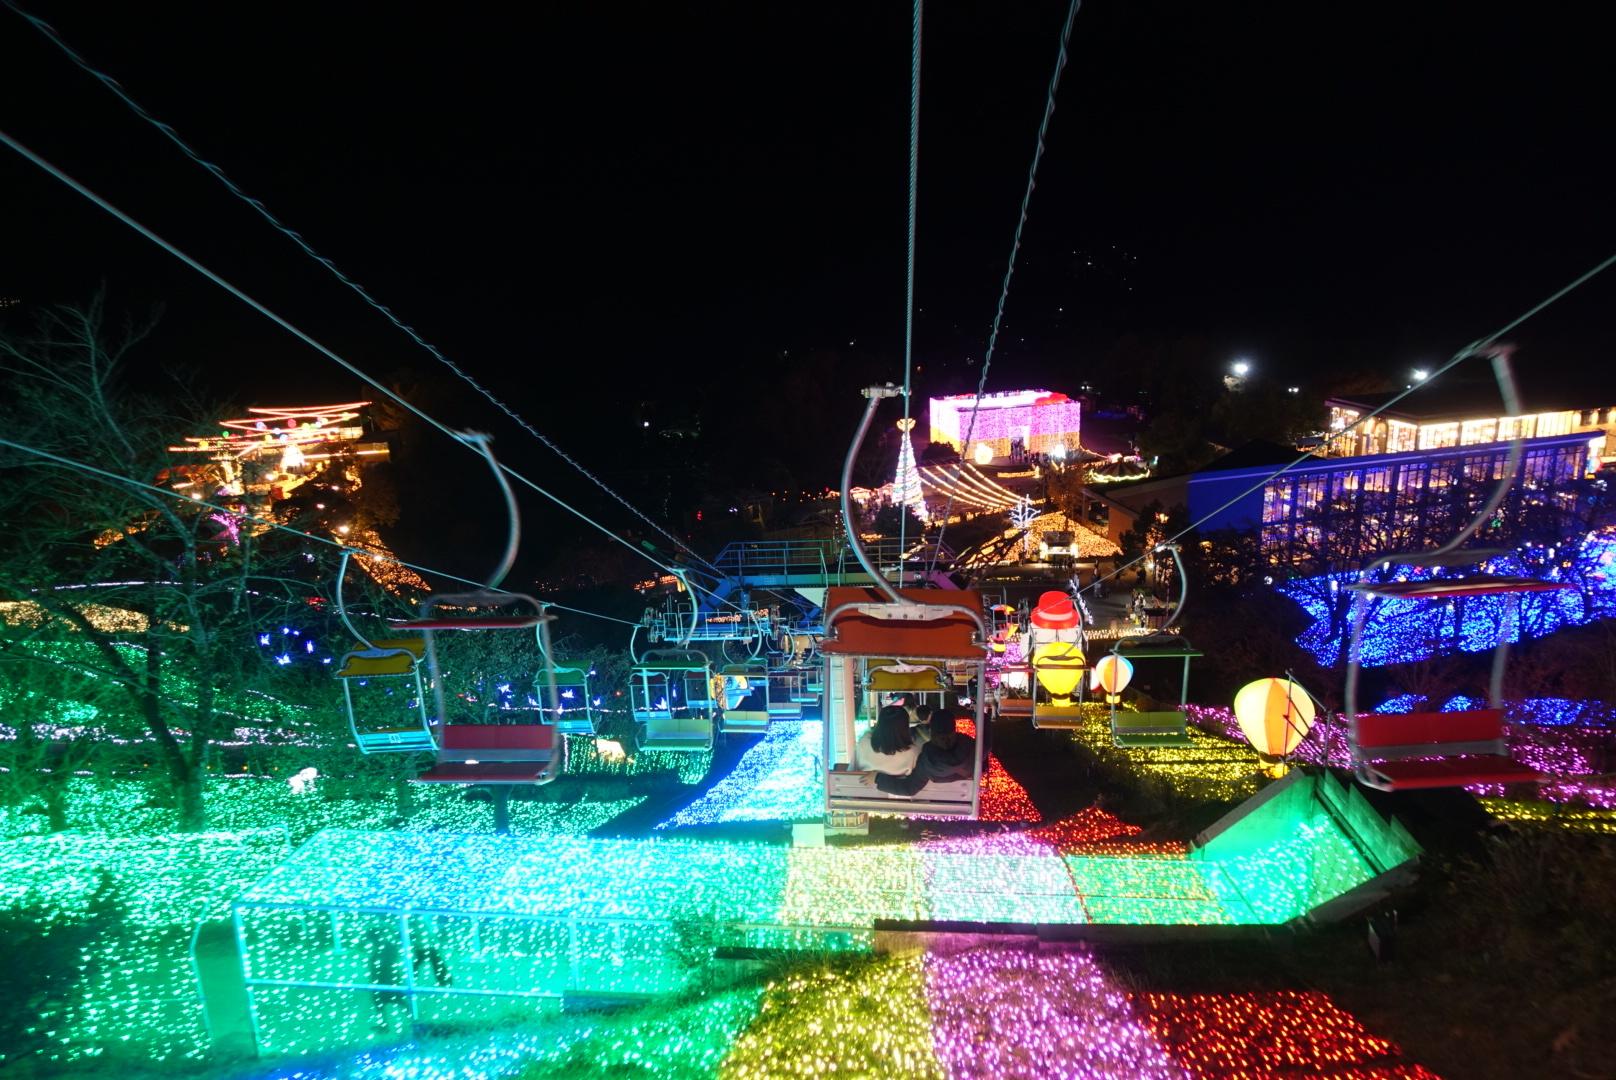 Vol.64♡ 関東最大級!600万級の光の祭典【さがみ湖イルミリオン】_1_7